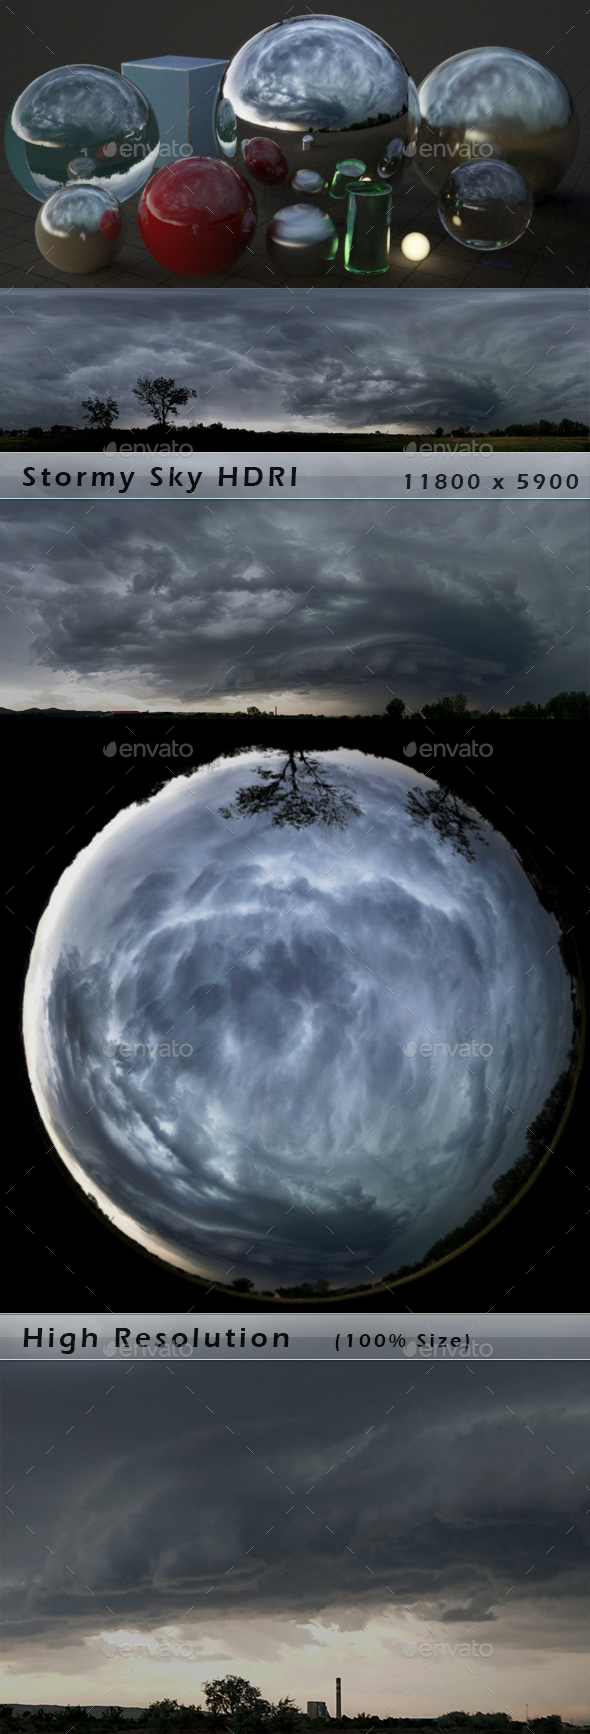 Stormy Sky HDRI